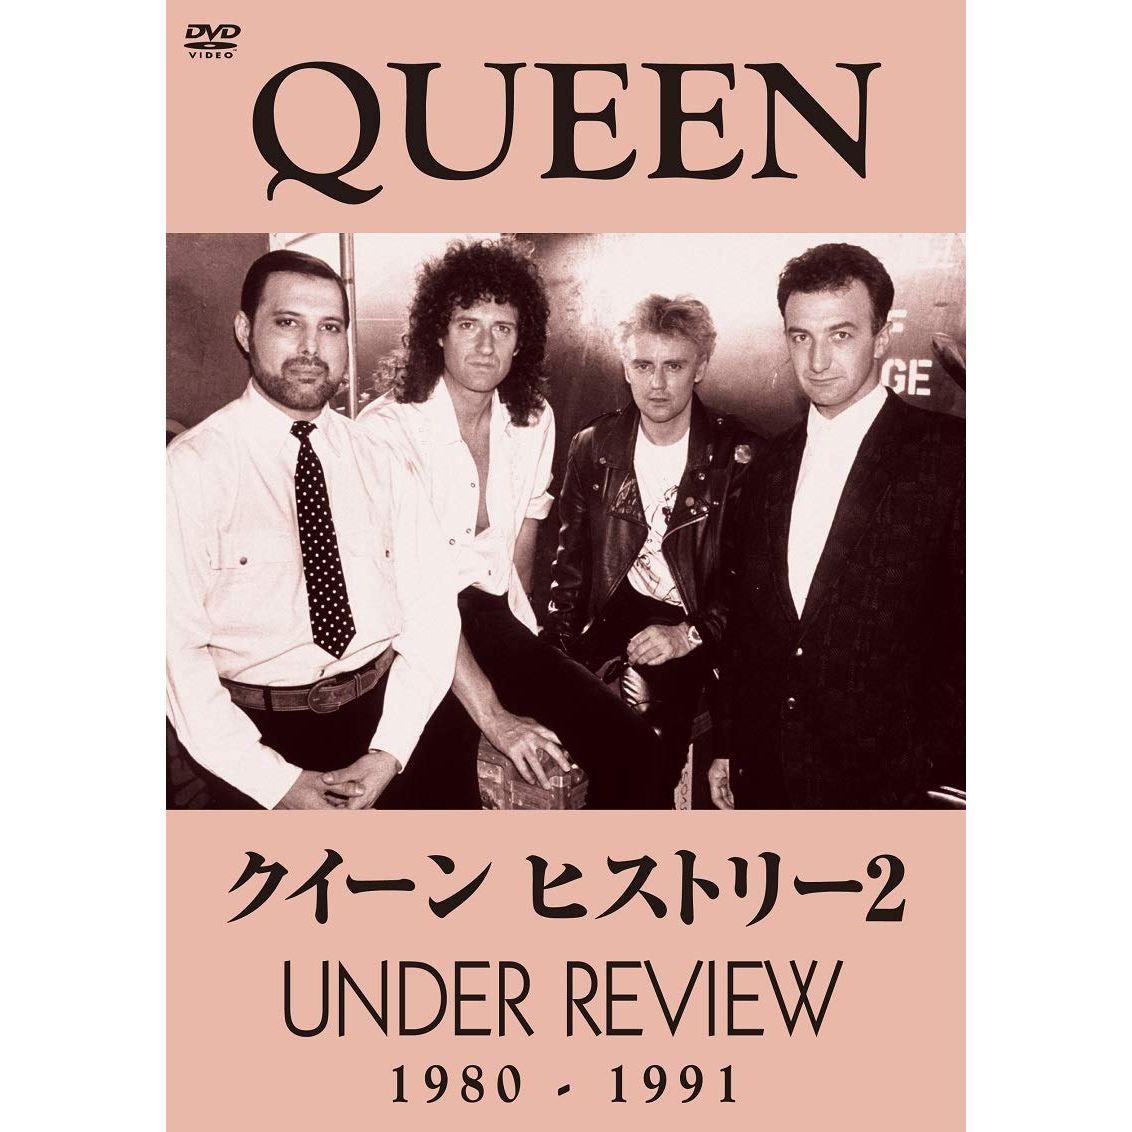 QUEEN / クイーン / クイーン ヒストリー2 1980-1991